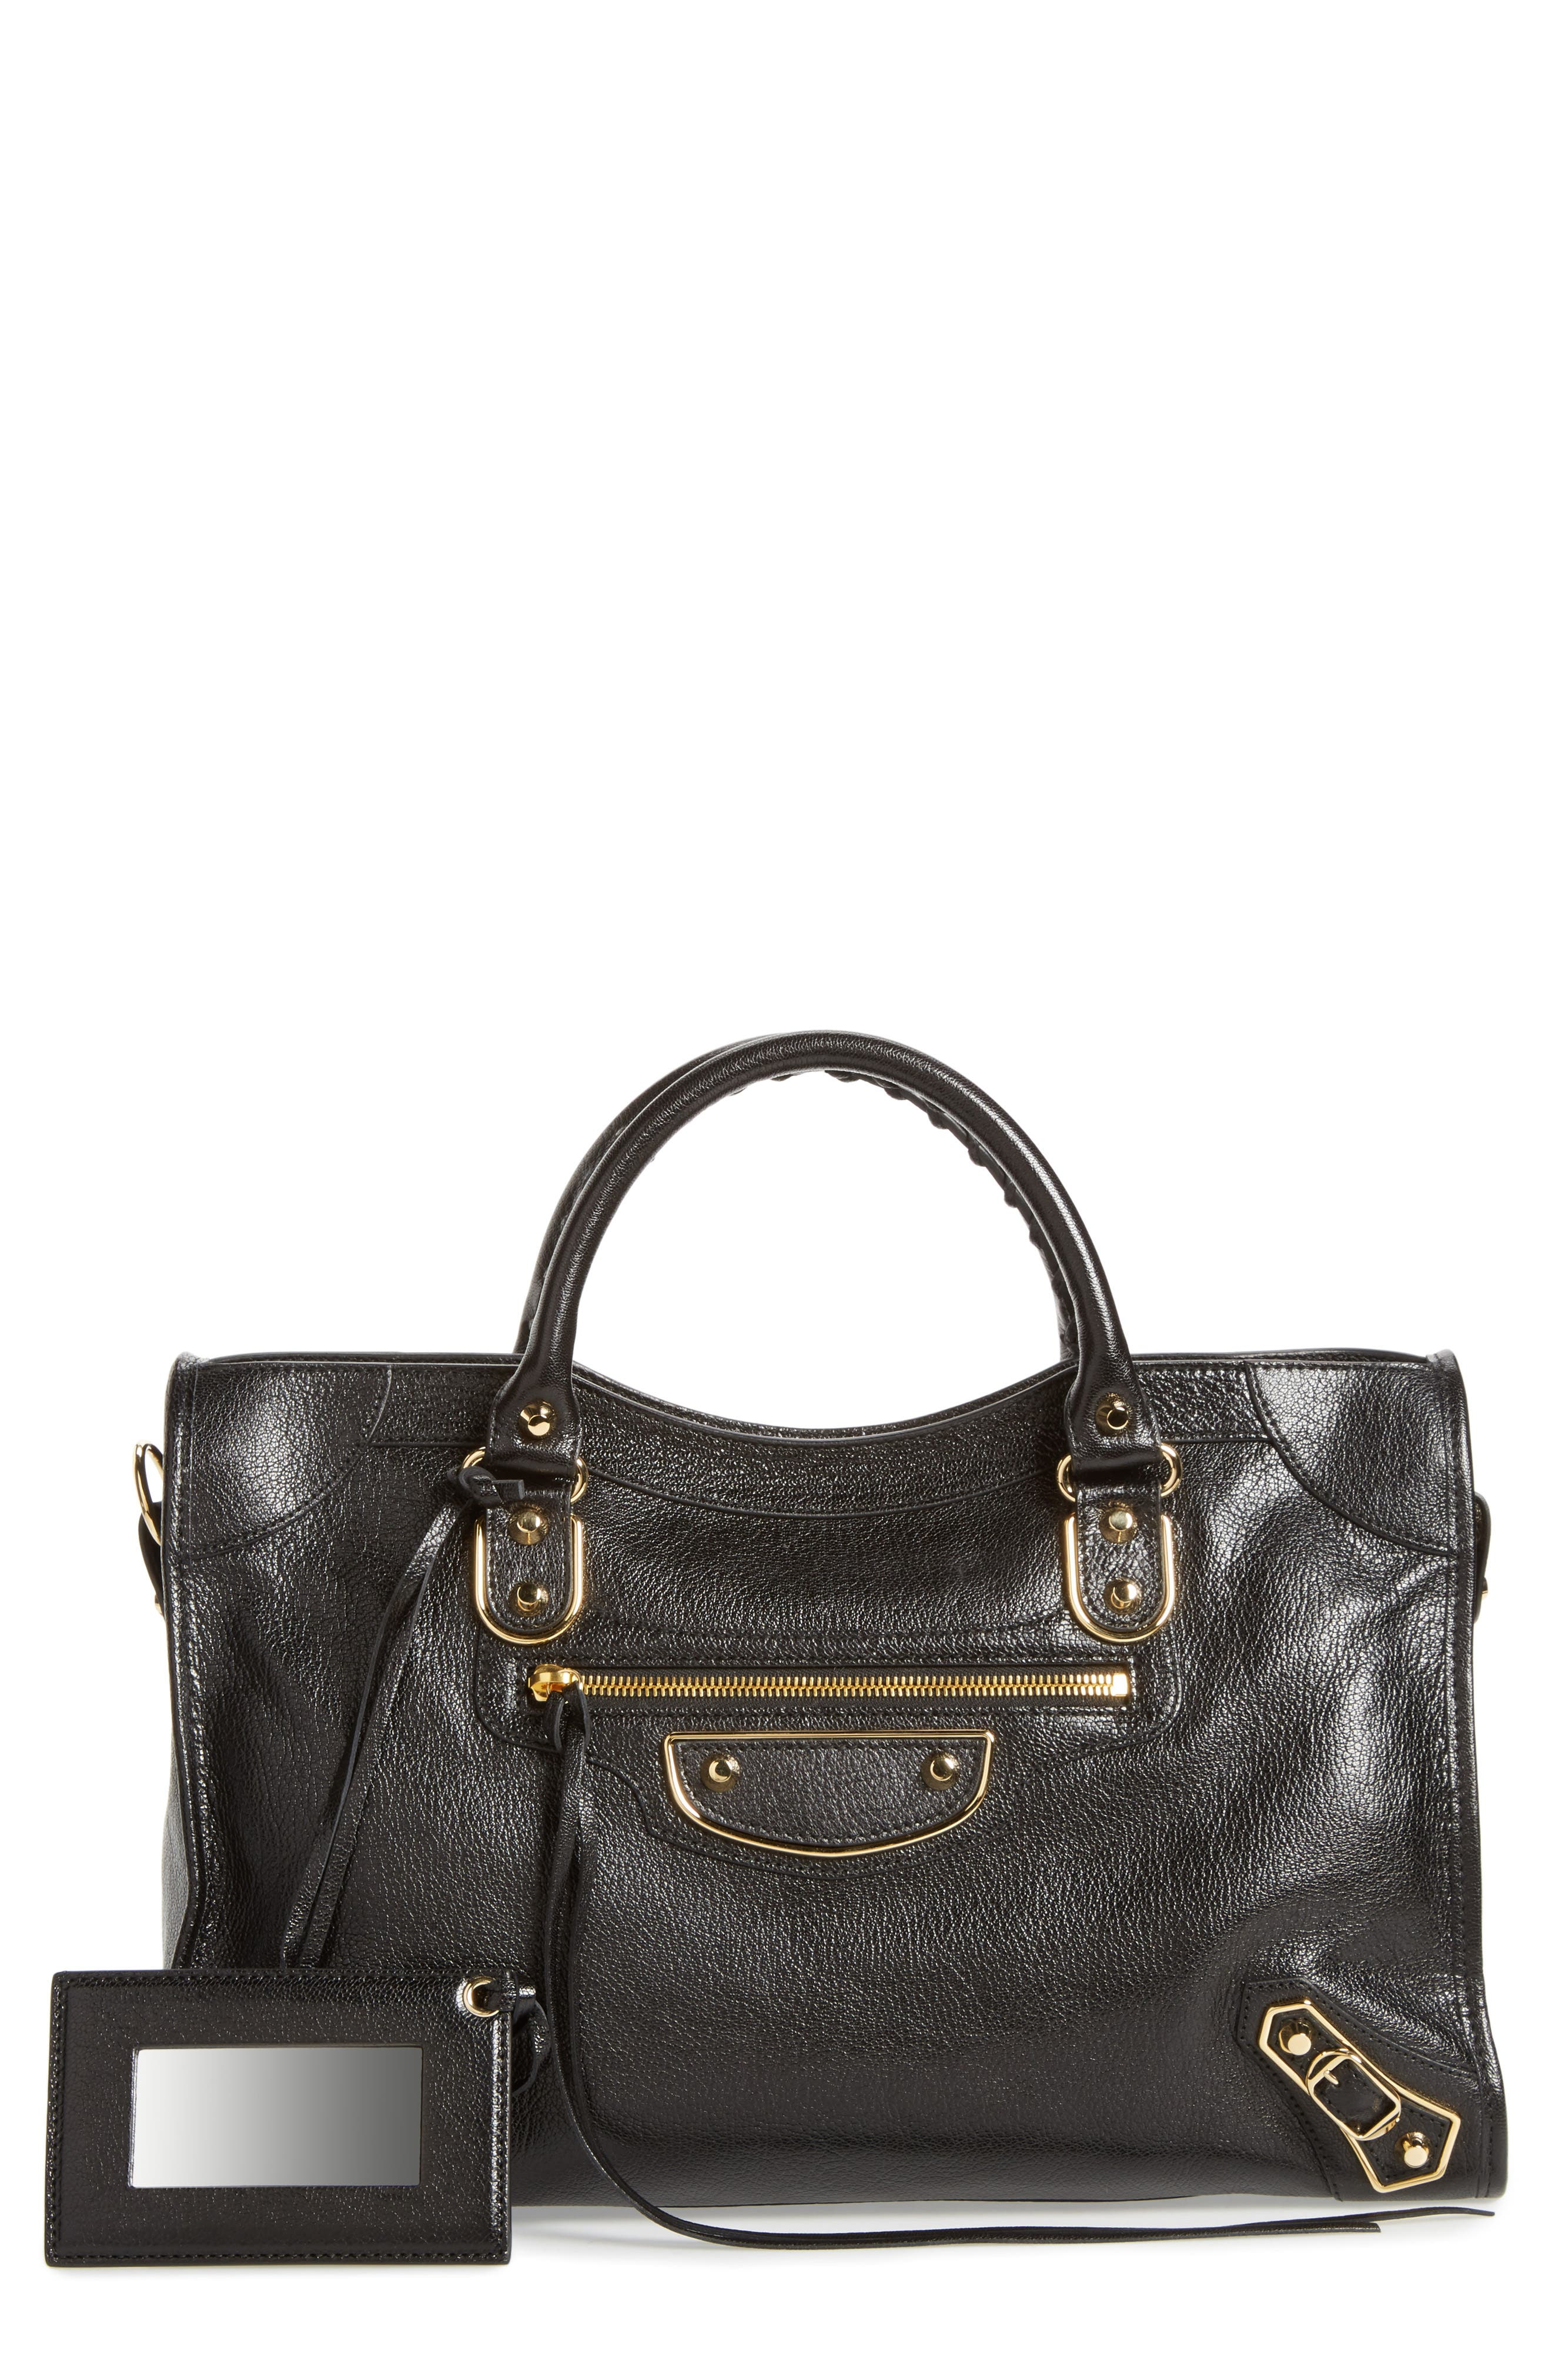 BALENCIAGA PARIS Balenciaga Classic Metallic Edge City Leather Tote